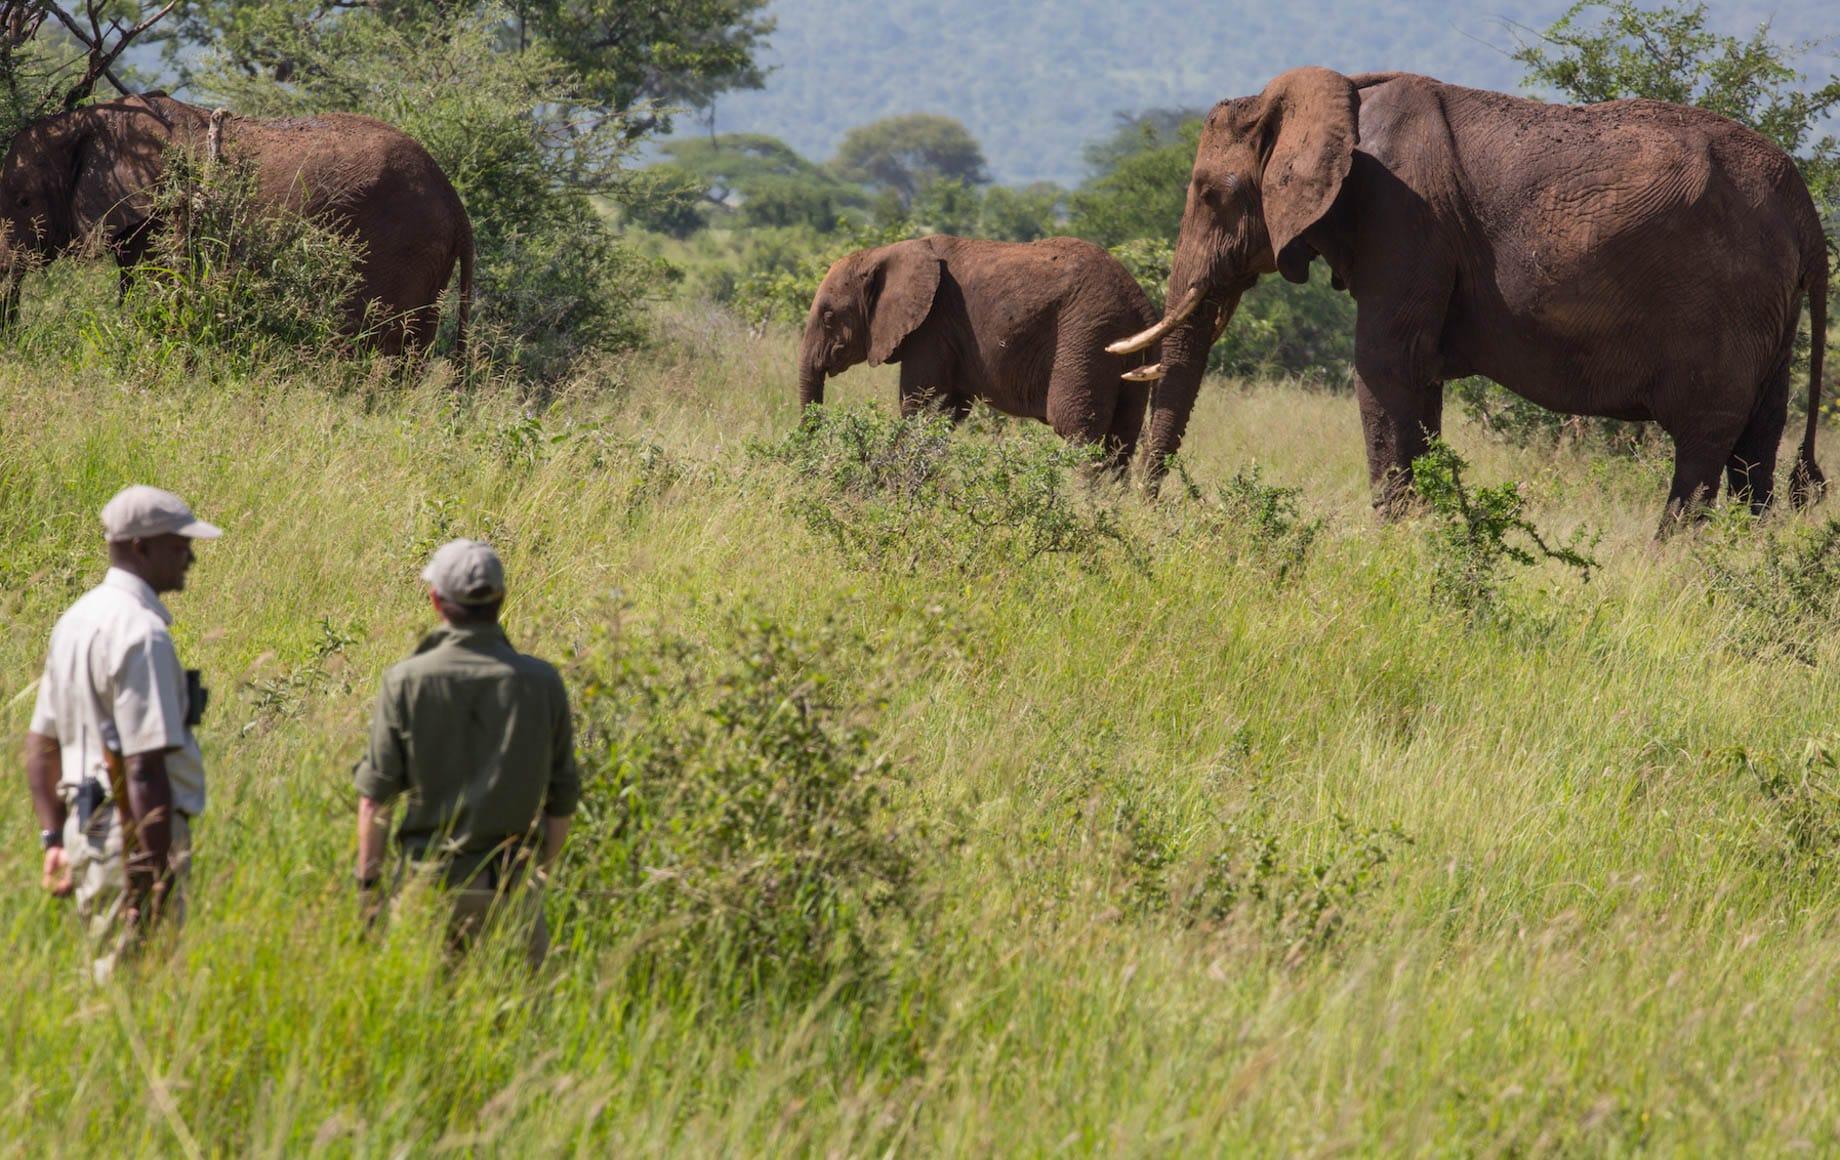 Seeing walking elephants nearby at Tarangire Treetops Lodge